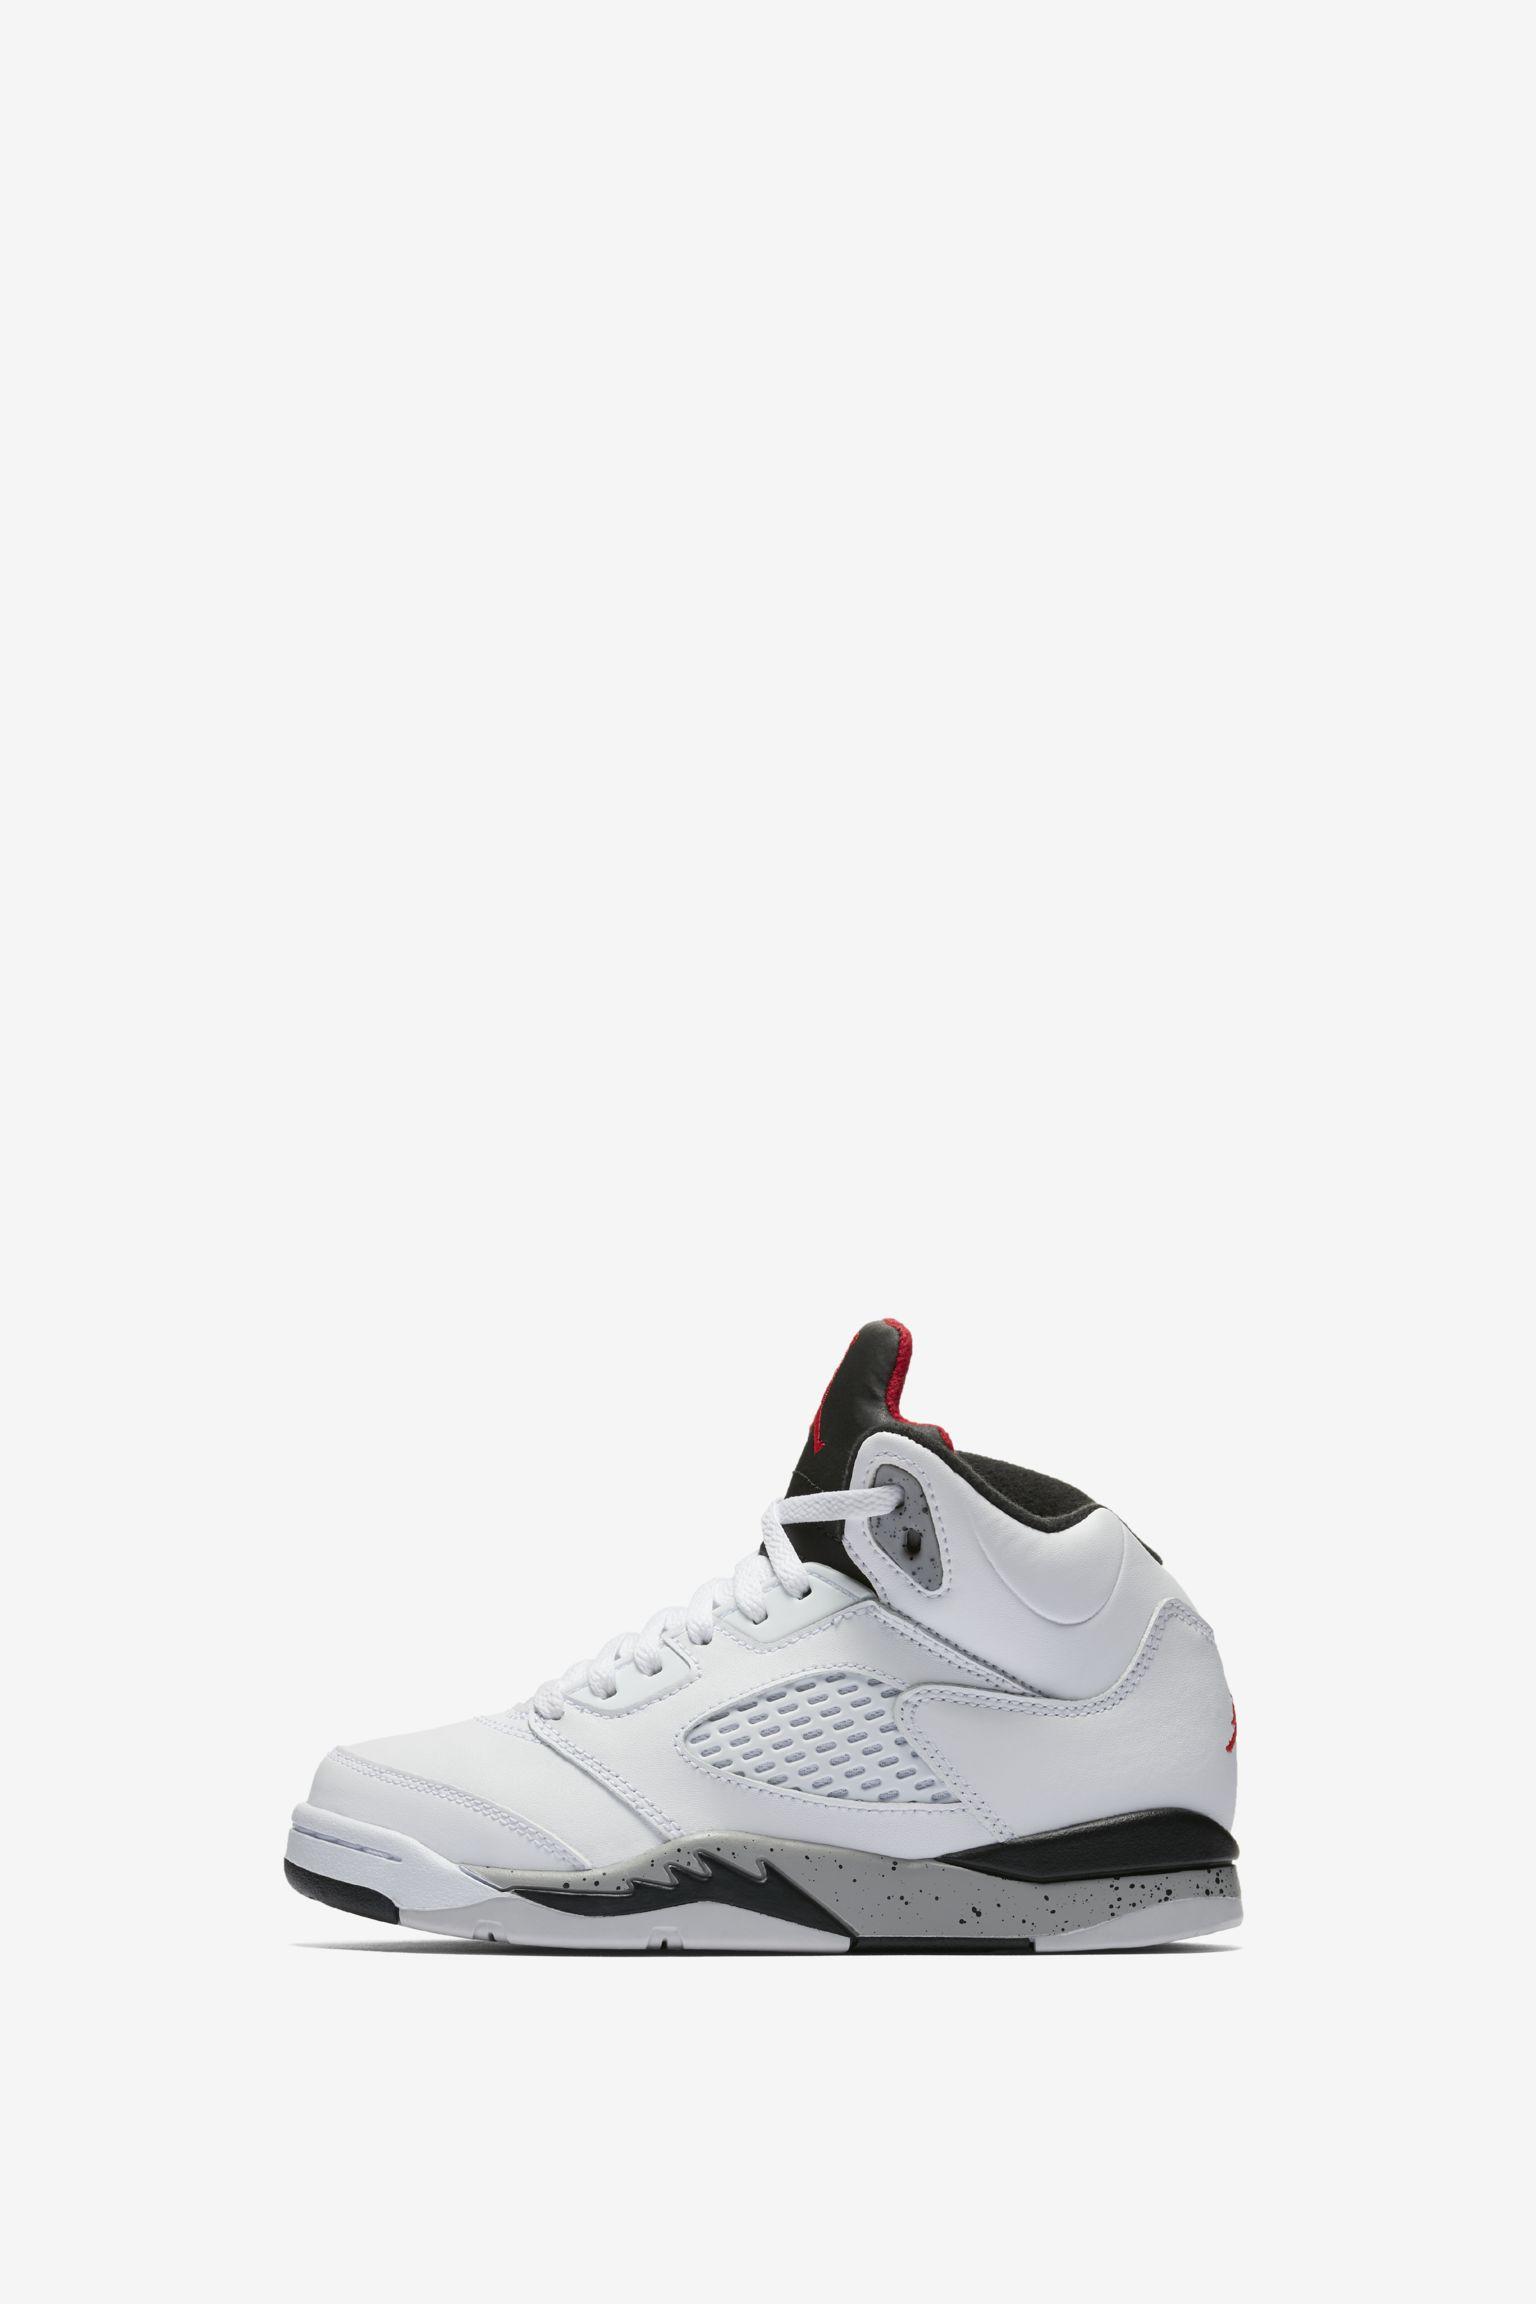 Air Jordan 5 Retro  White   Black   University Red  Release Date ... fc9f1bb7201f